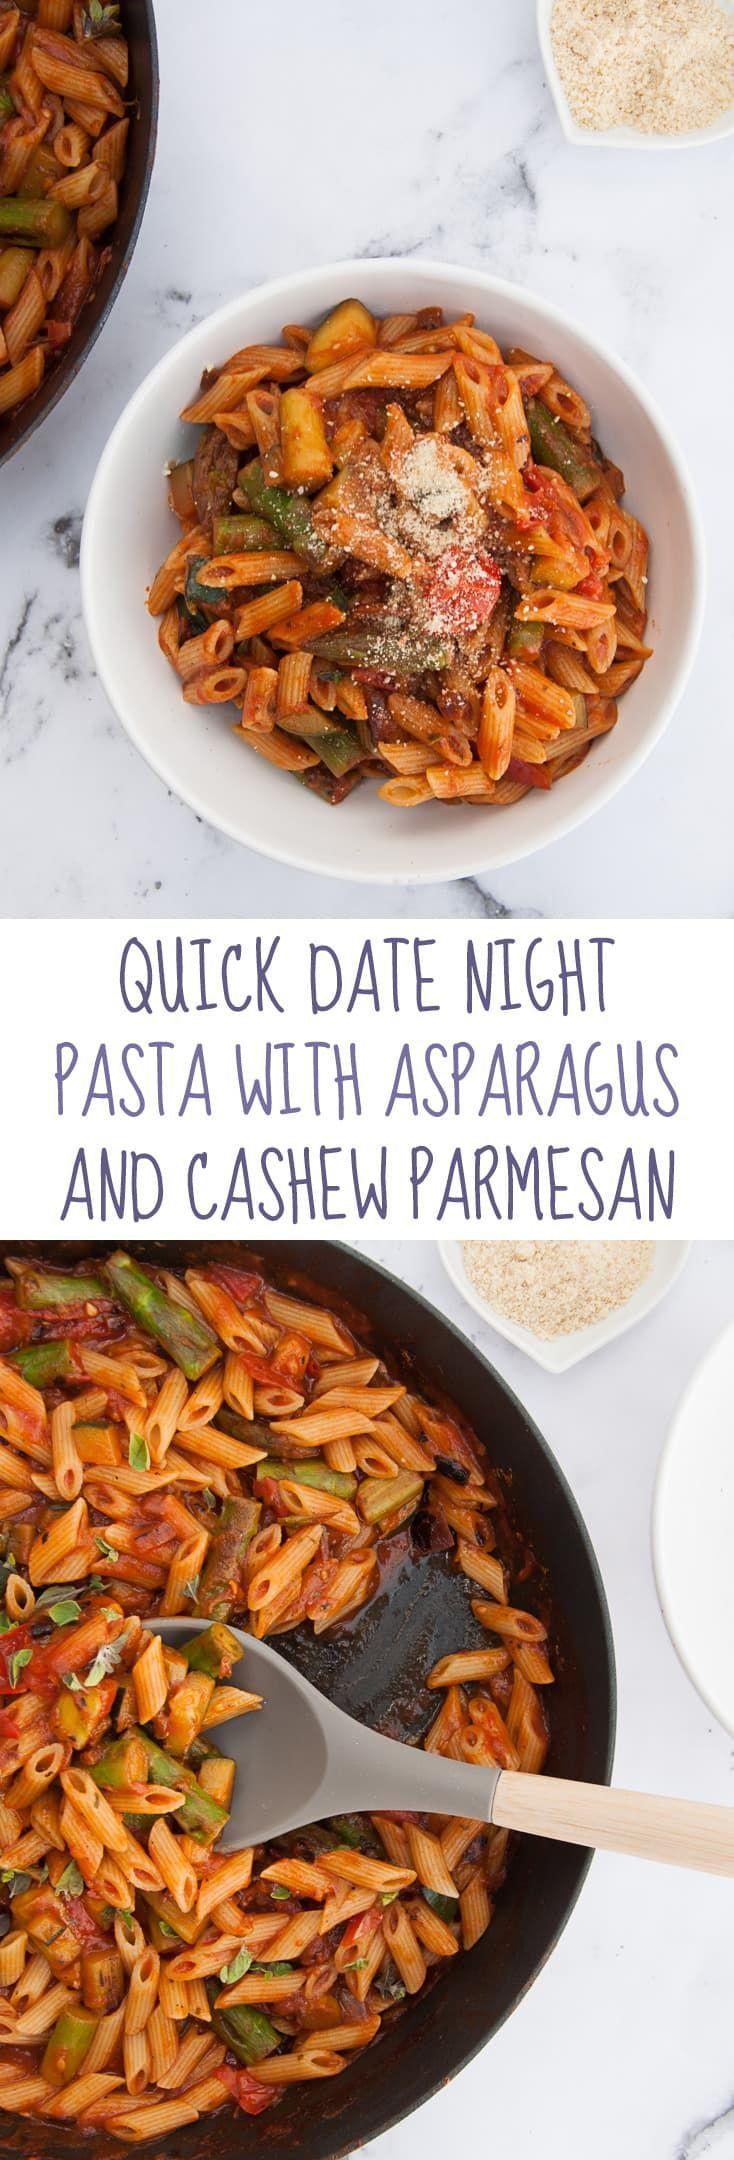 Quick Date Night Pasta with Asparagus and Cashew Parmesan via @elephantasticv